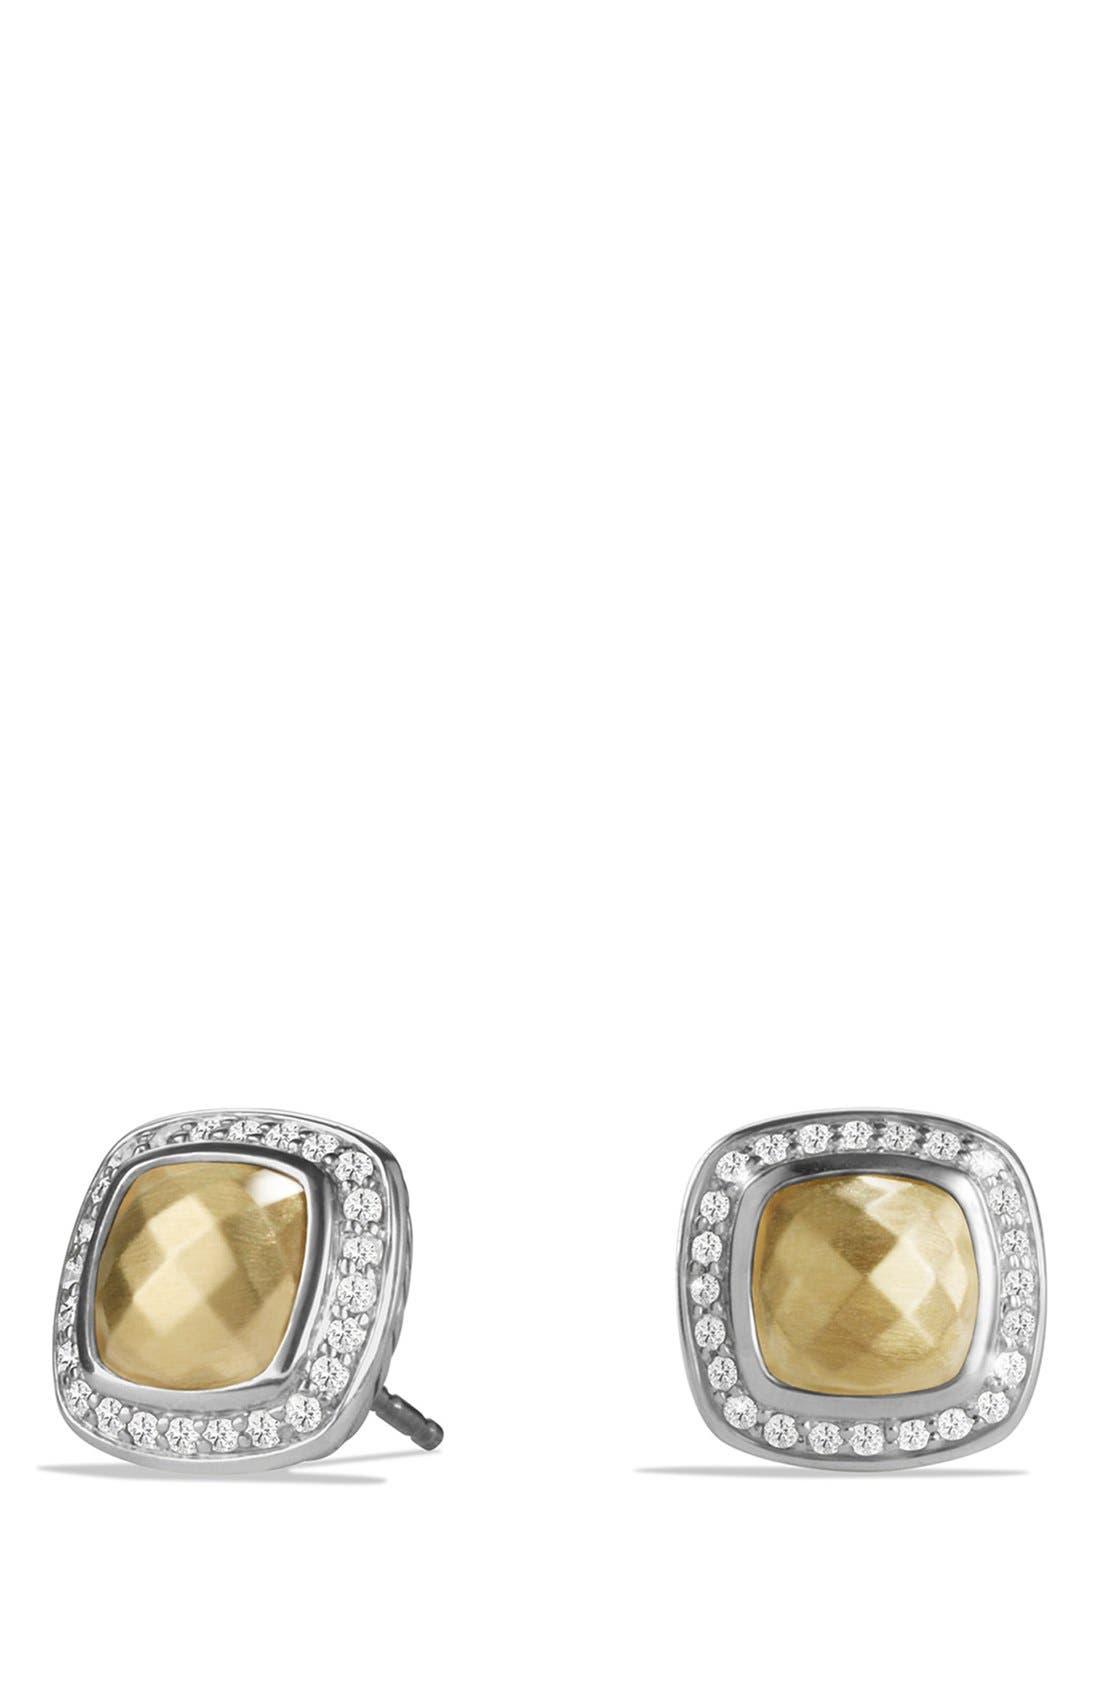 DAVID YURMAN 'Albion' Earrings with 18K Gold Dome